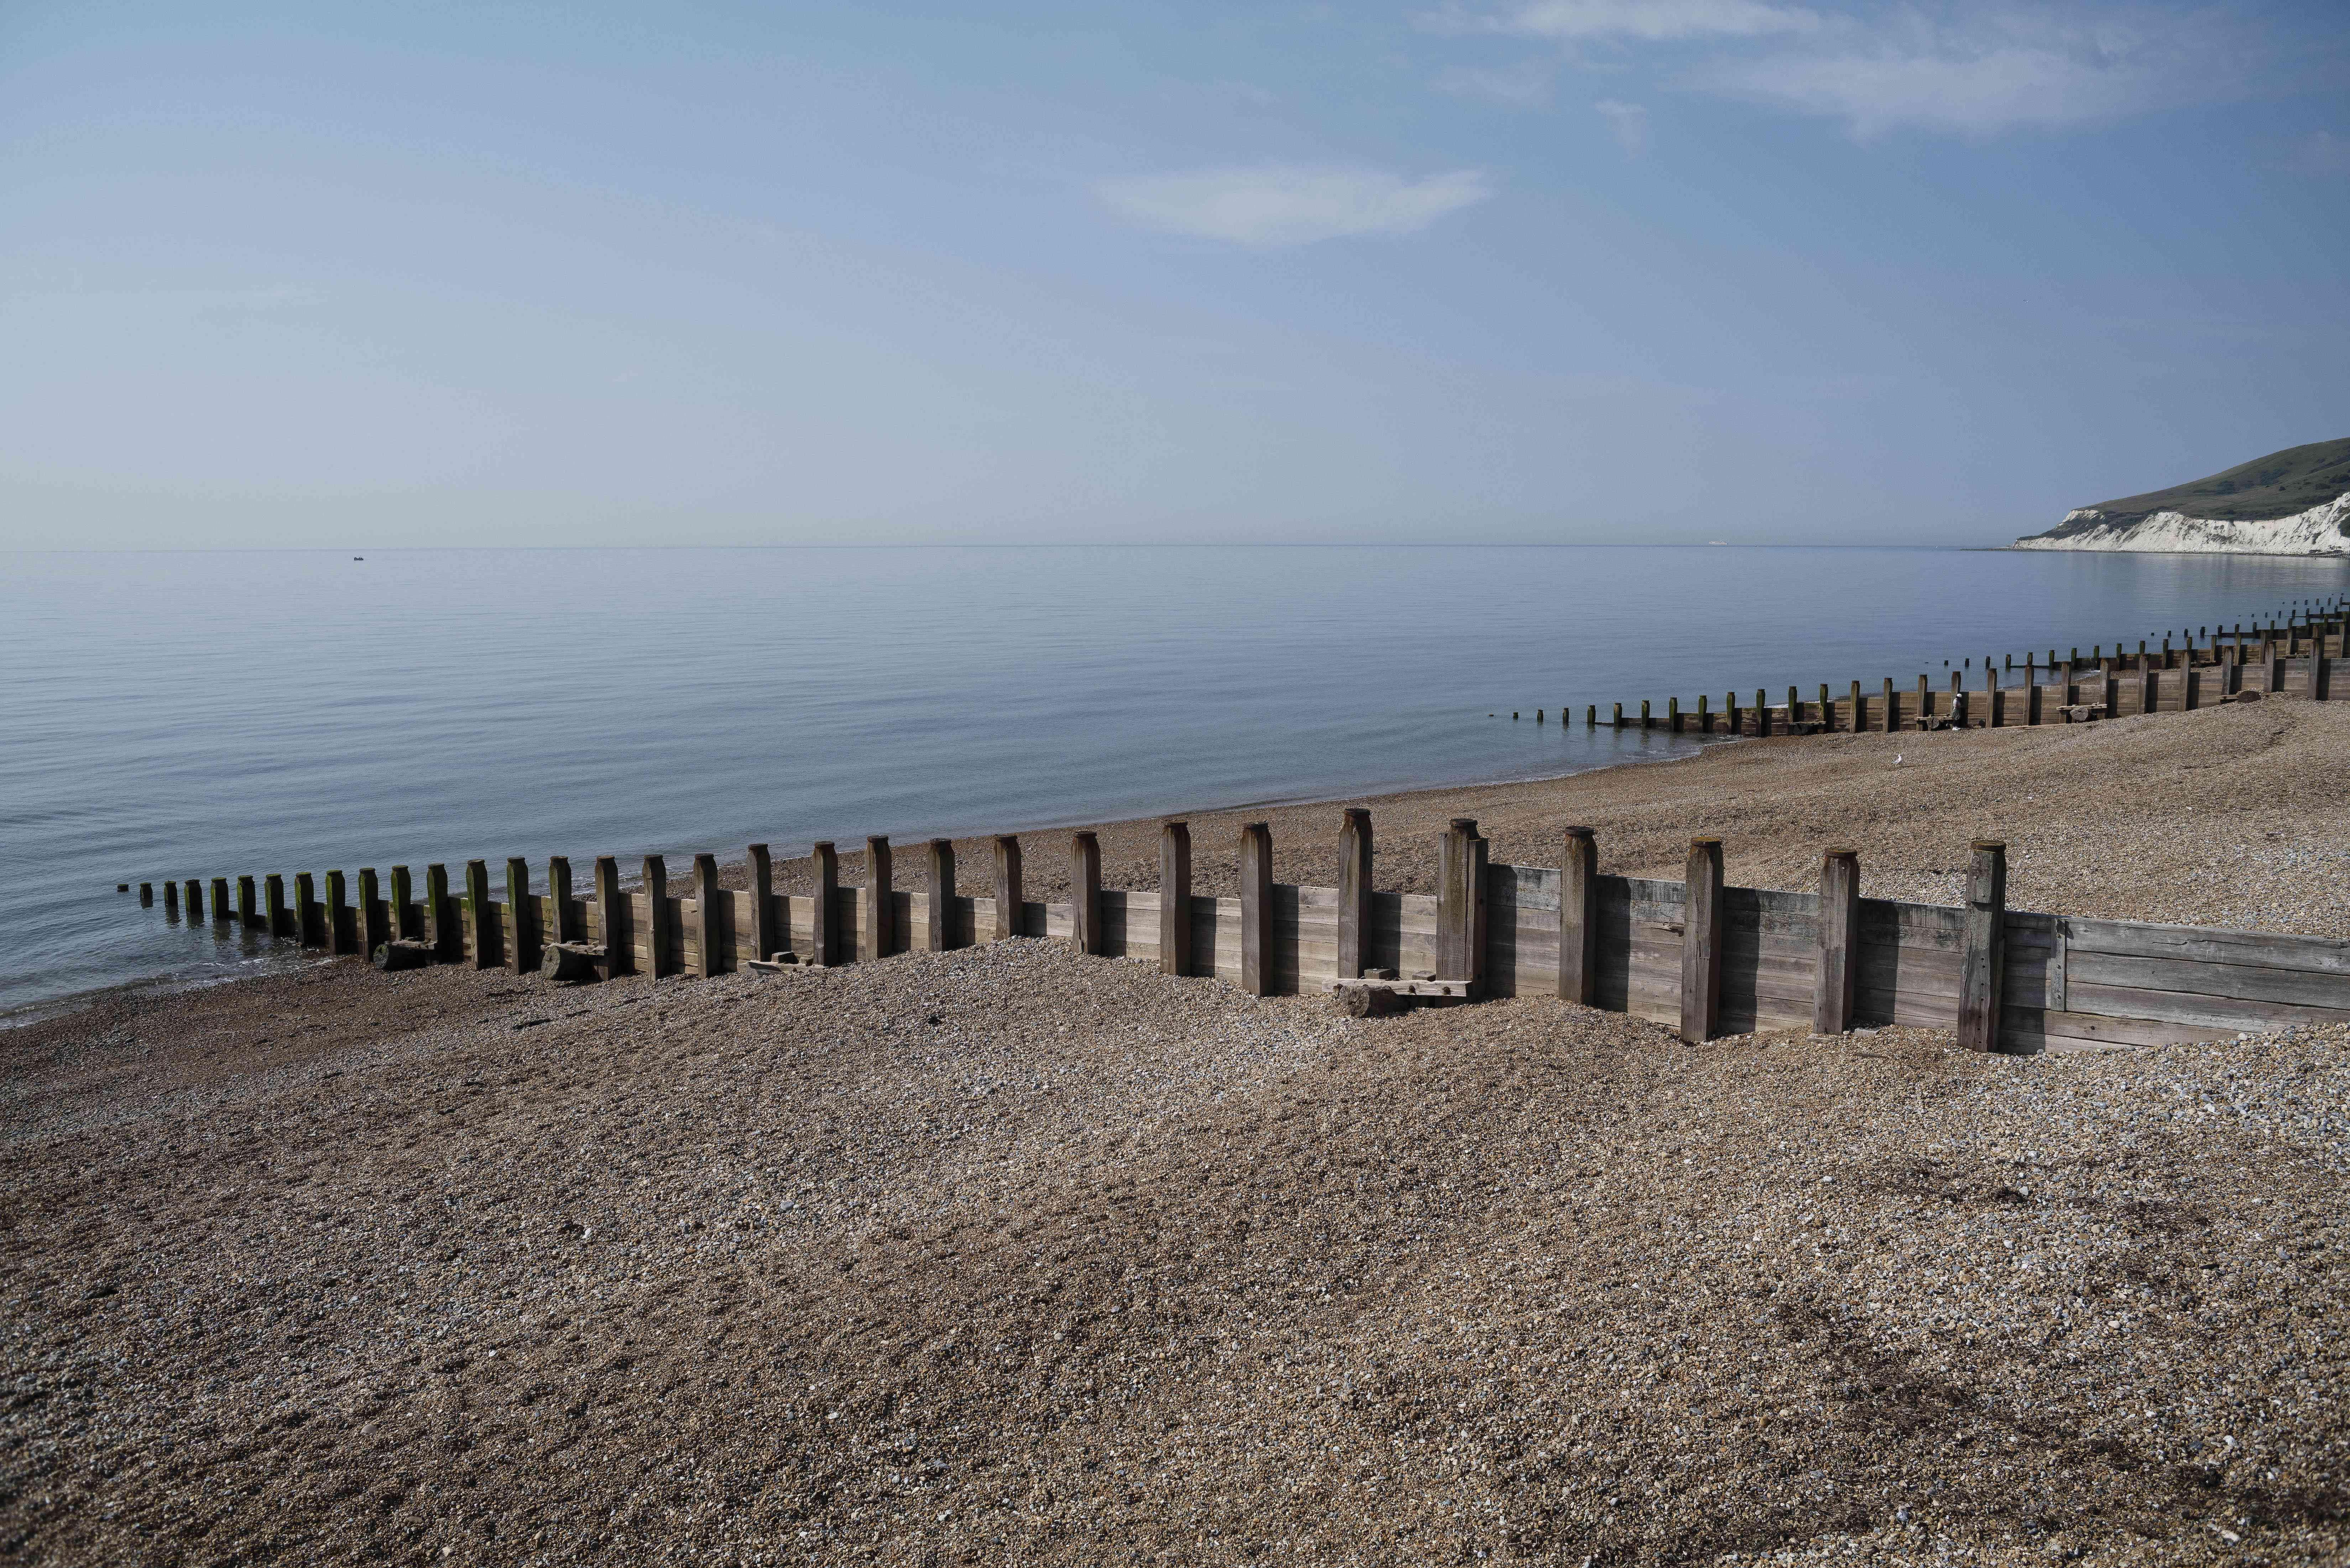 Eastbourne Beach in Eastbourne, England